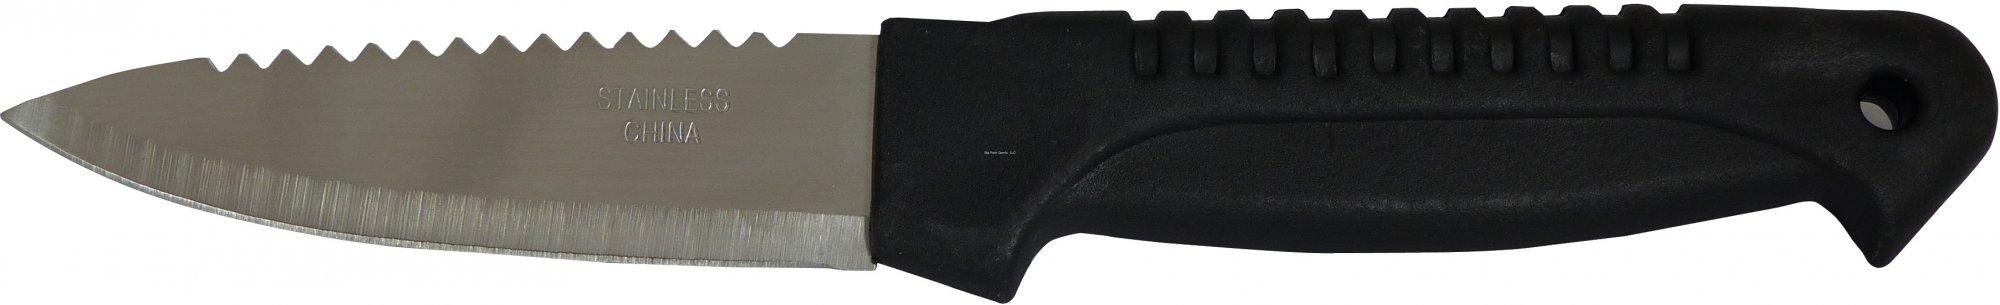 Pucci Bait Knife Nylon Black Handle/Scaler